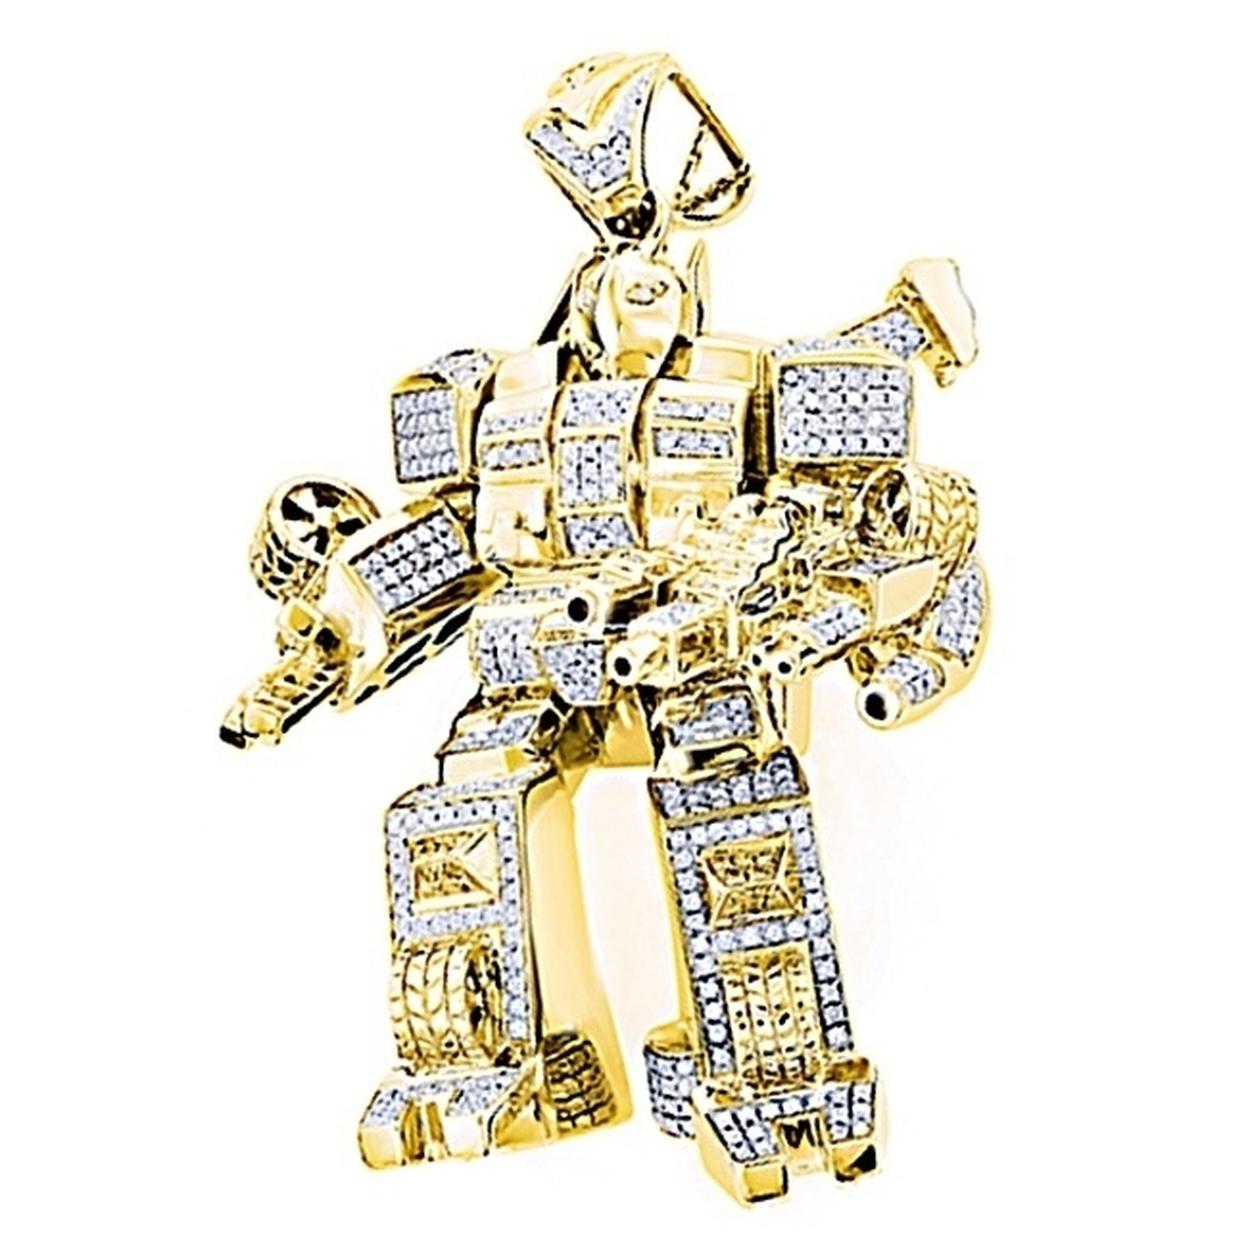 1.25 Ct Round Cut D/vvs1 14K Gold Over Men's Transformer Pendant 59afdb092a00e445bd009319